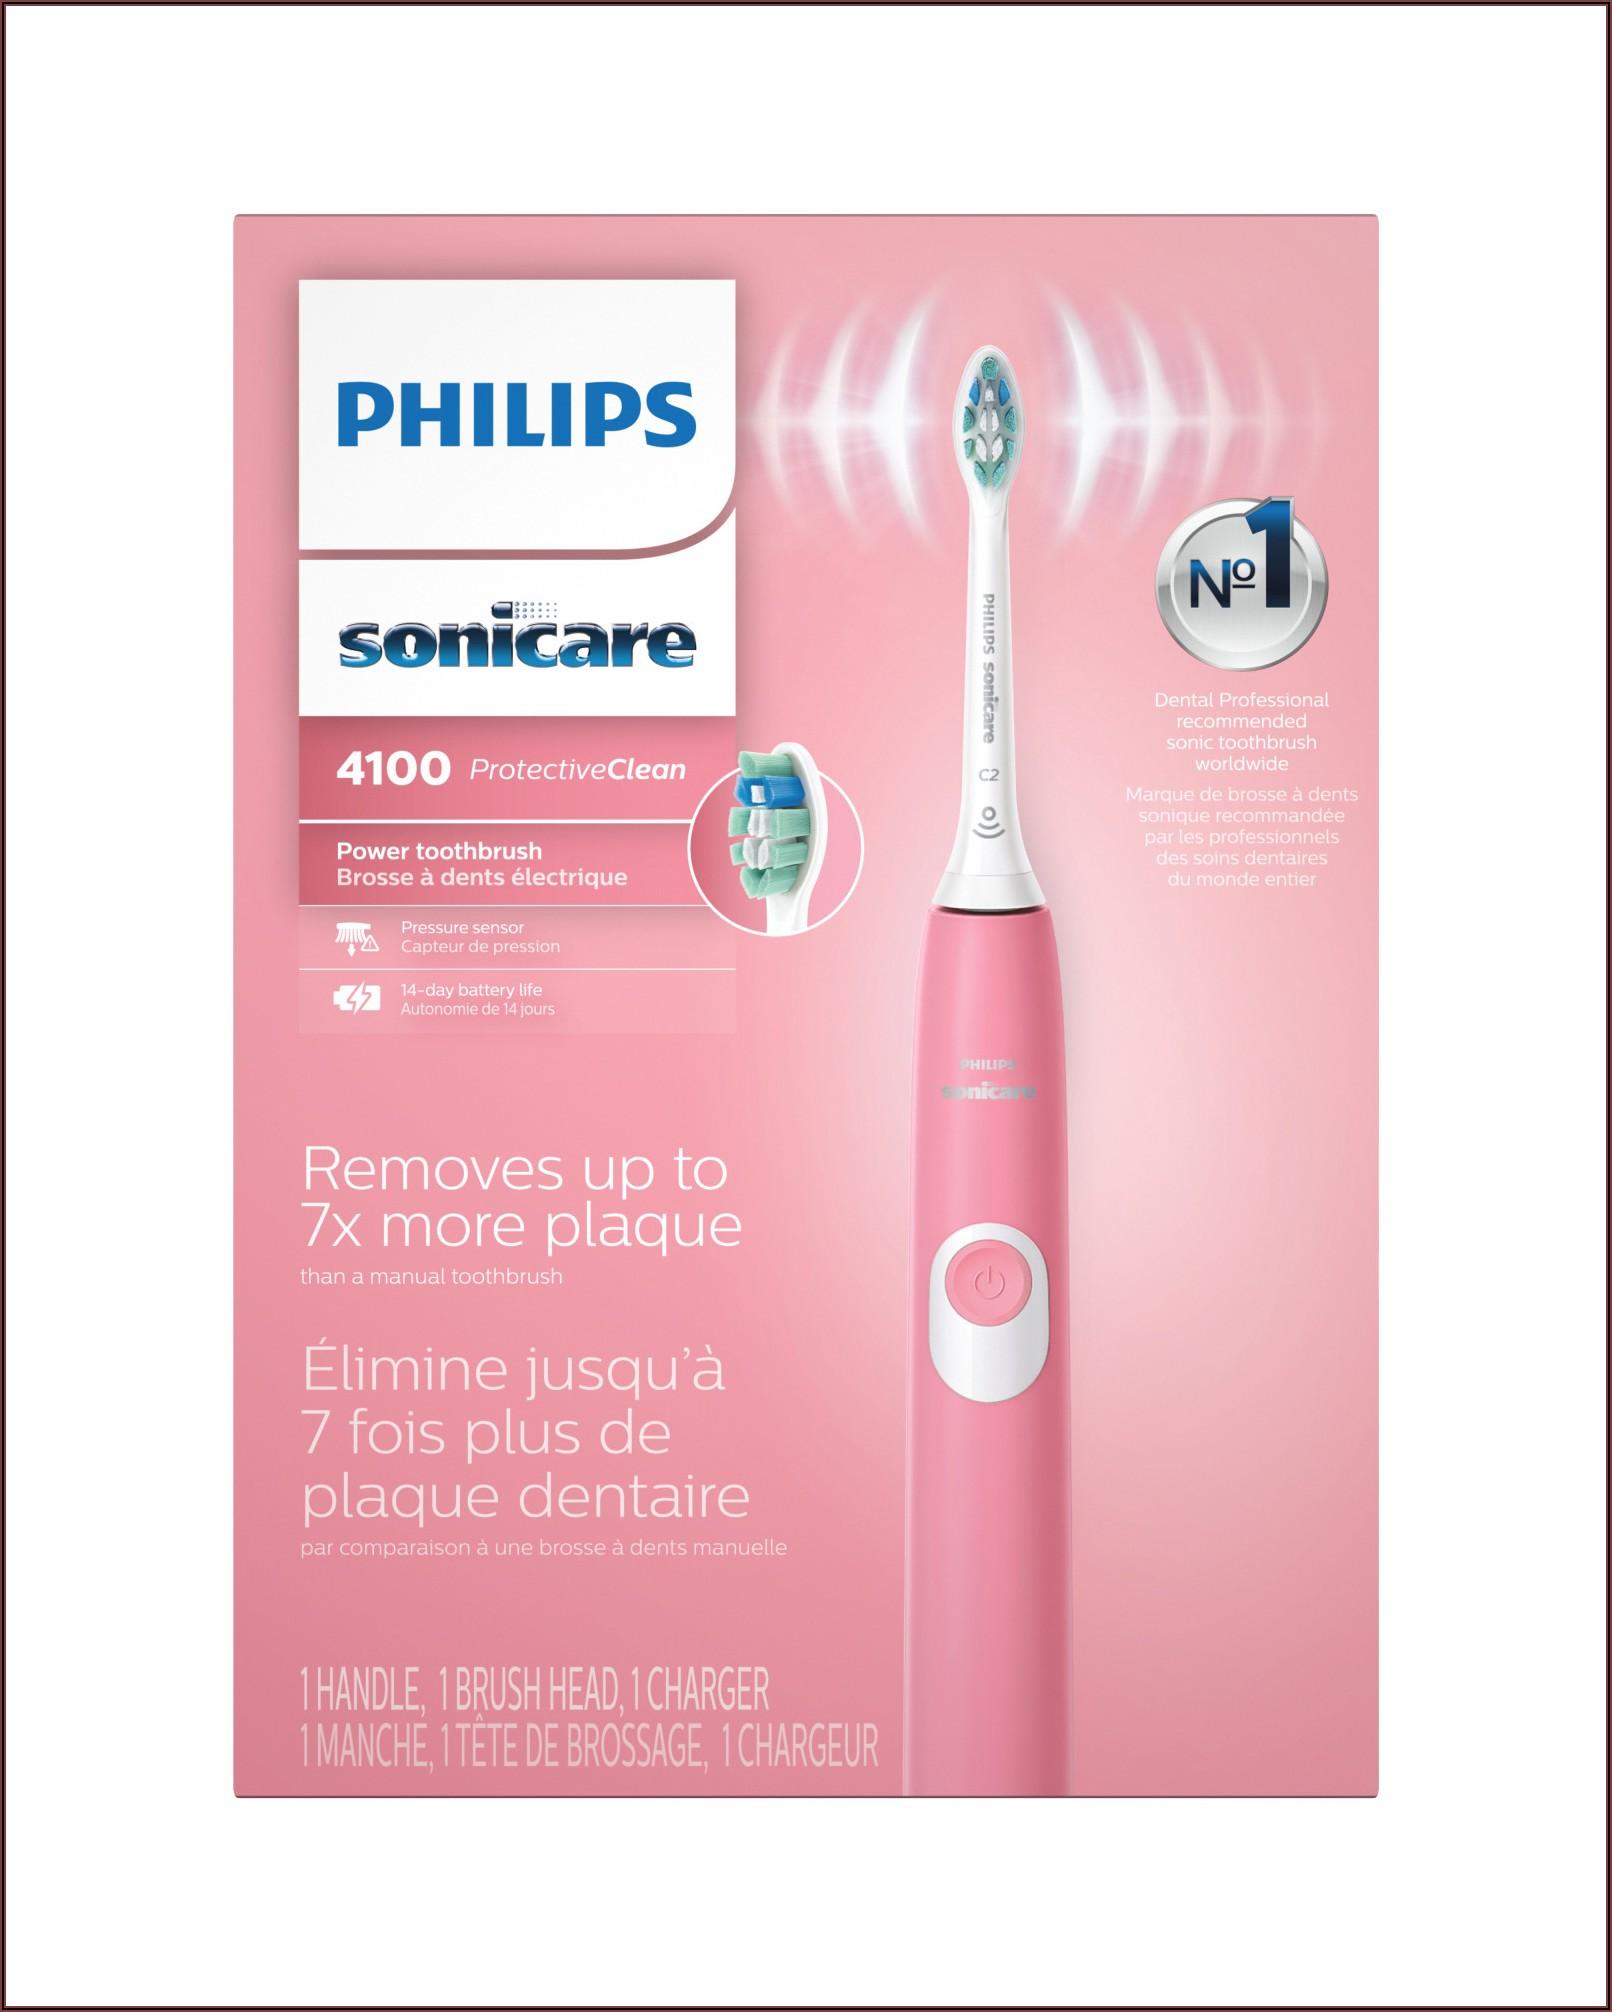 Philips Sonicare 5100 Rebate Form